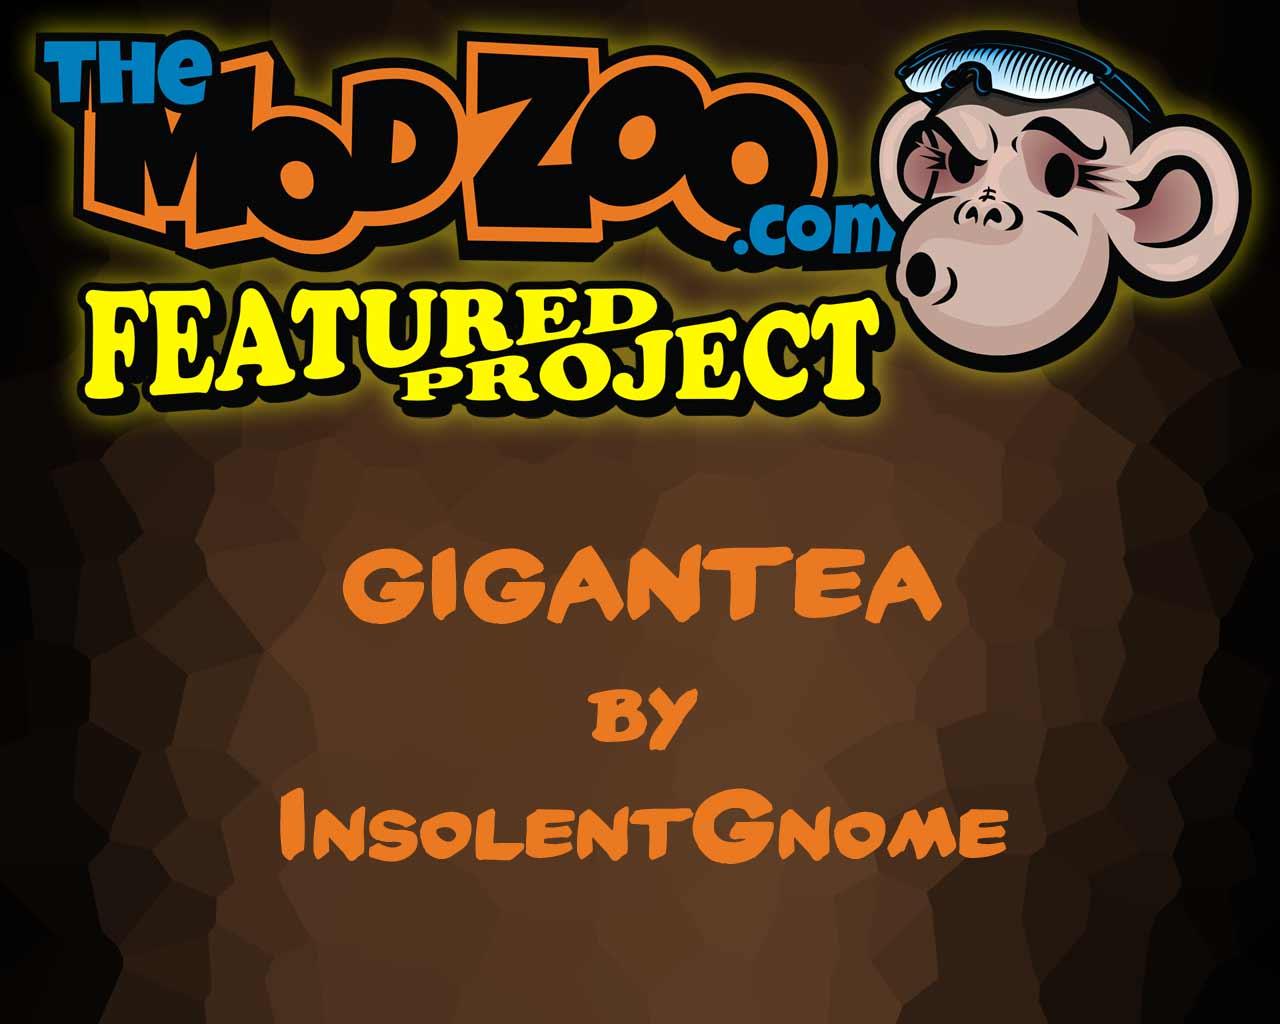 featured-project-gigantea-insolent-gnome